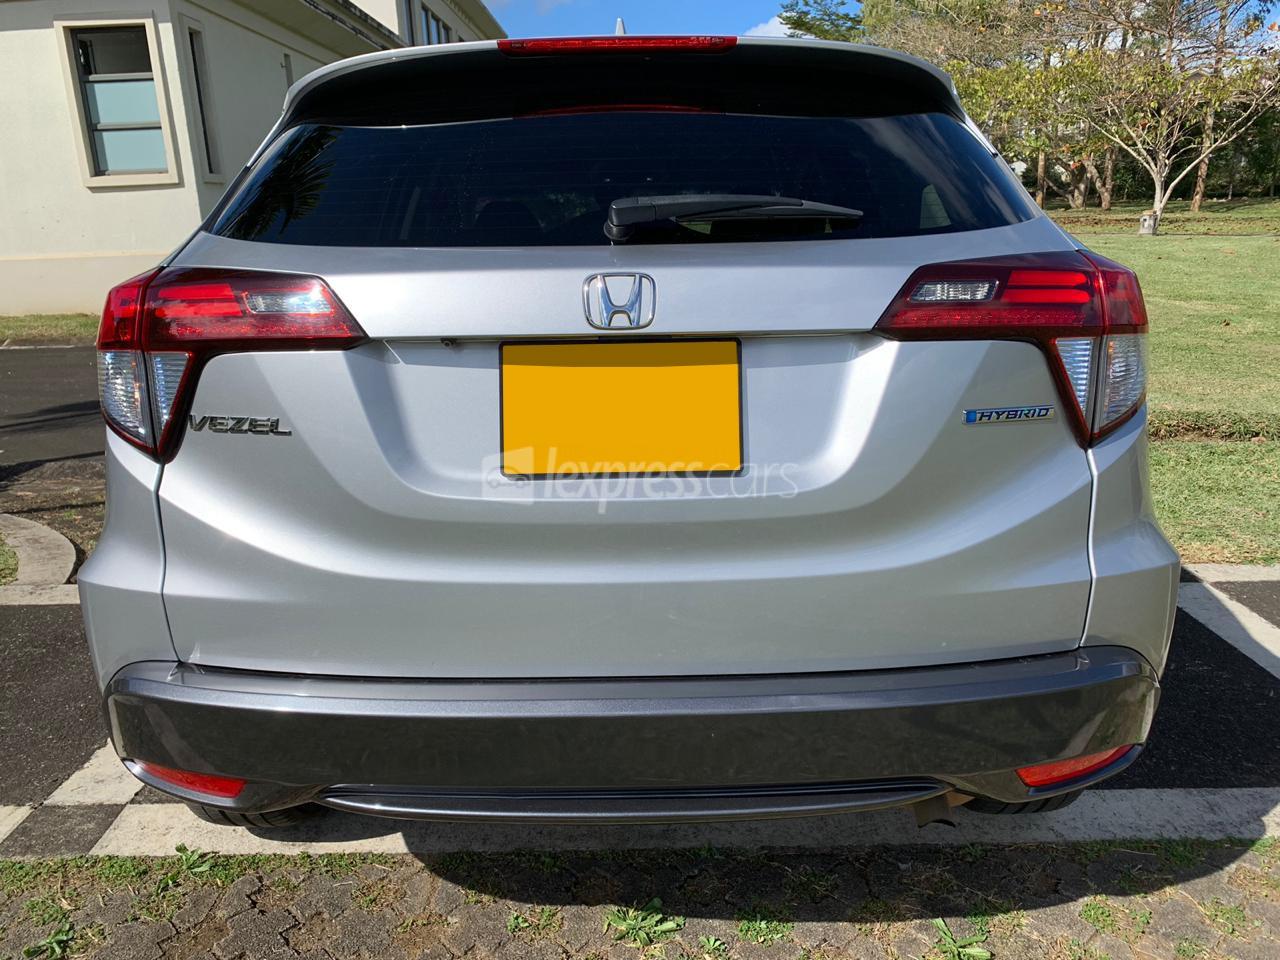 Second-Hand Honda Vezel / HR-V 2014 - lexpresscars.mu